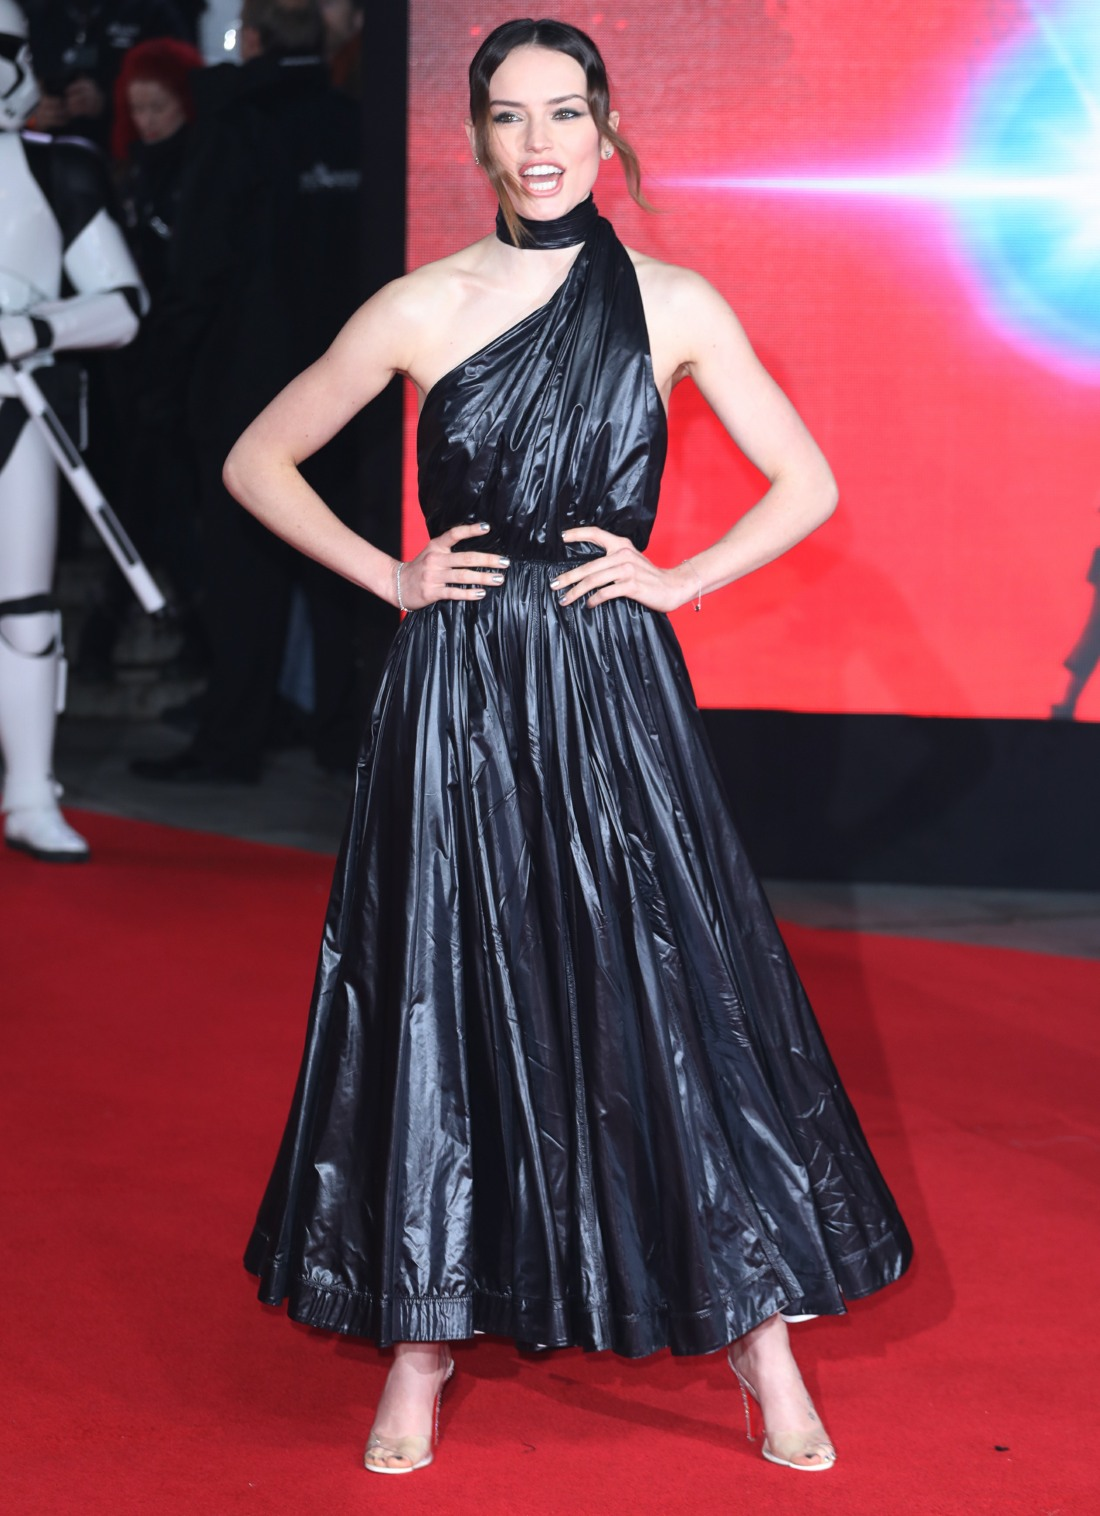 Star Wars Episode VIII The Last Jedi UK film premiere